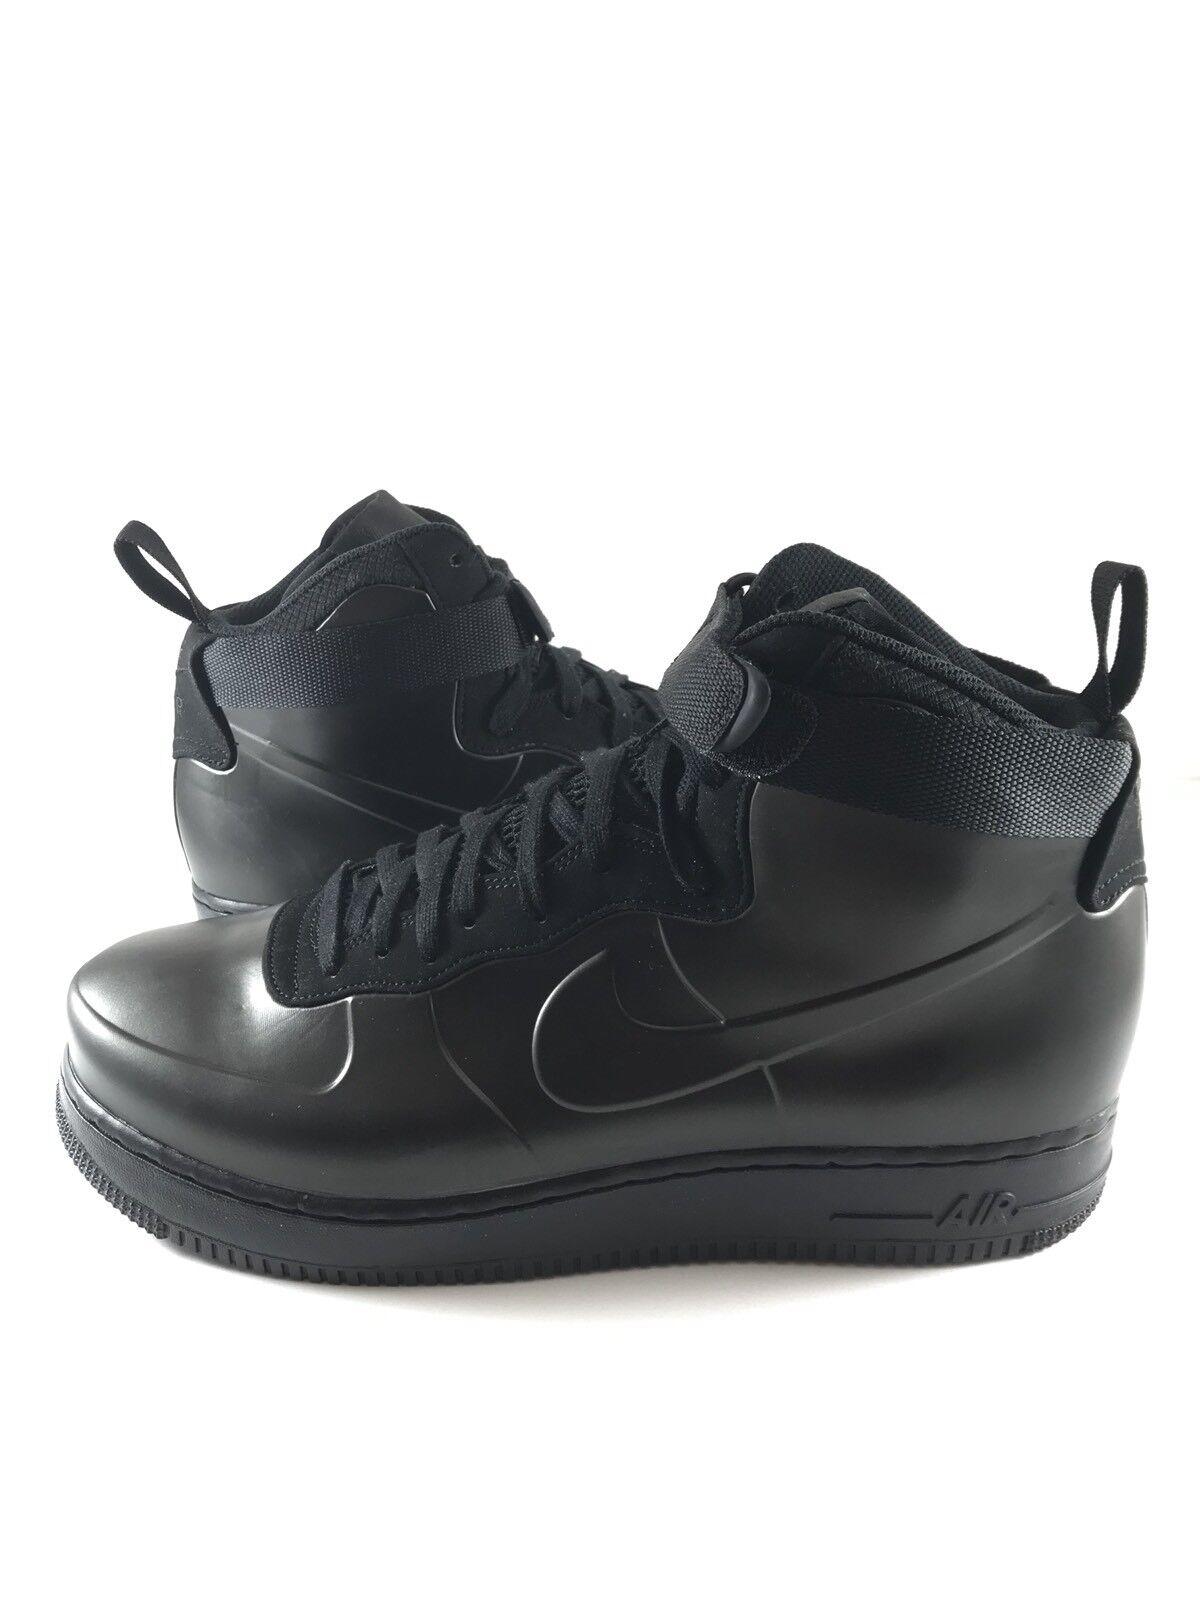 Nike Air Force 1 Foamposite Cupsole Triple Black AH6771 001 Mens Size 11 AF1